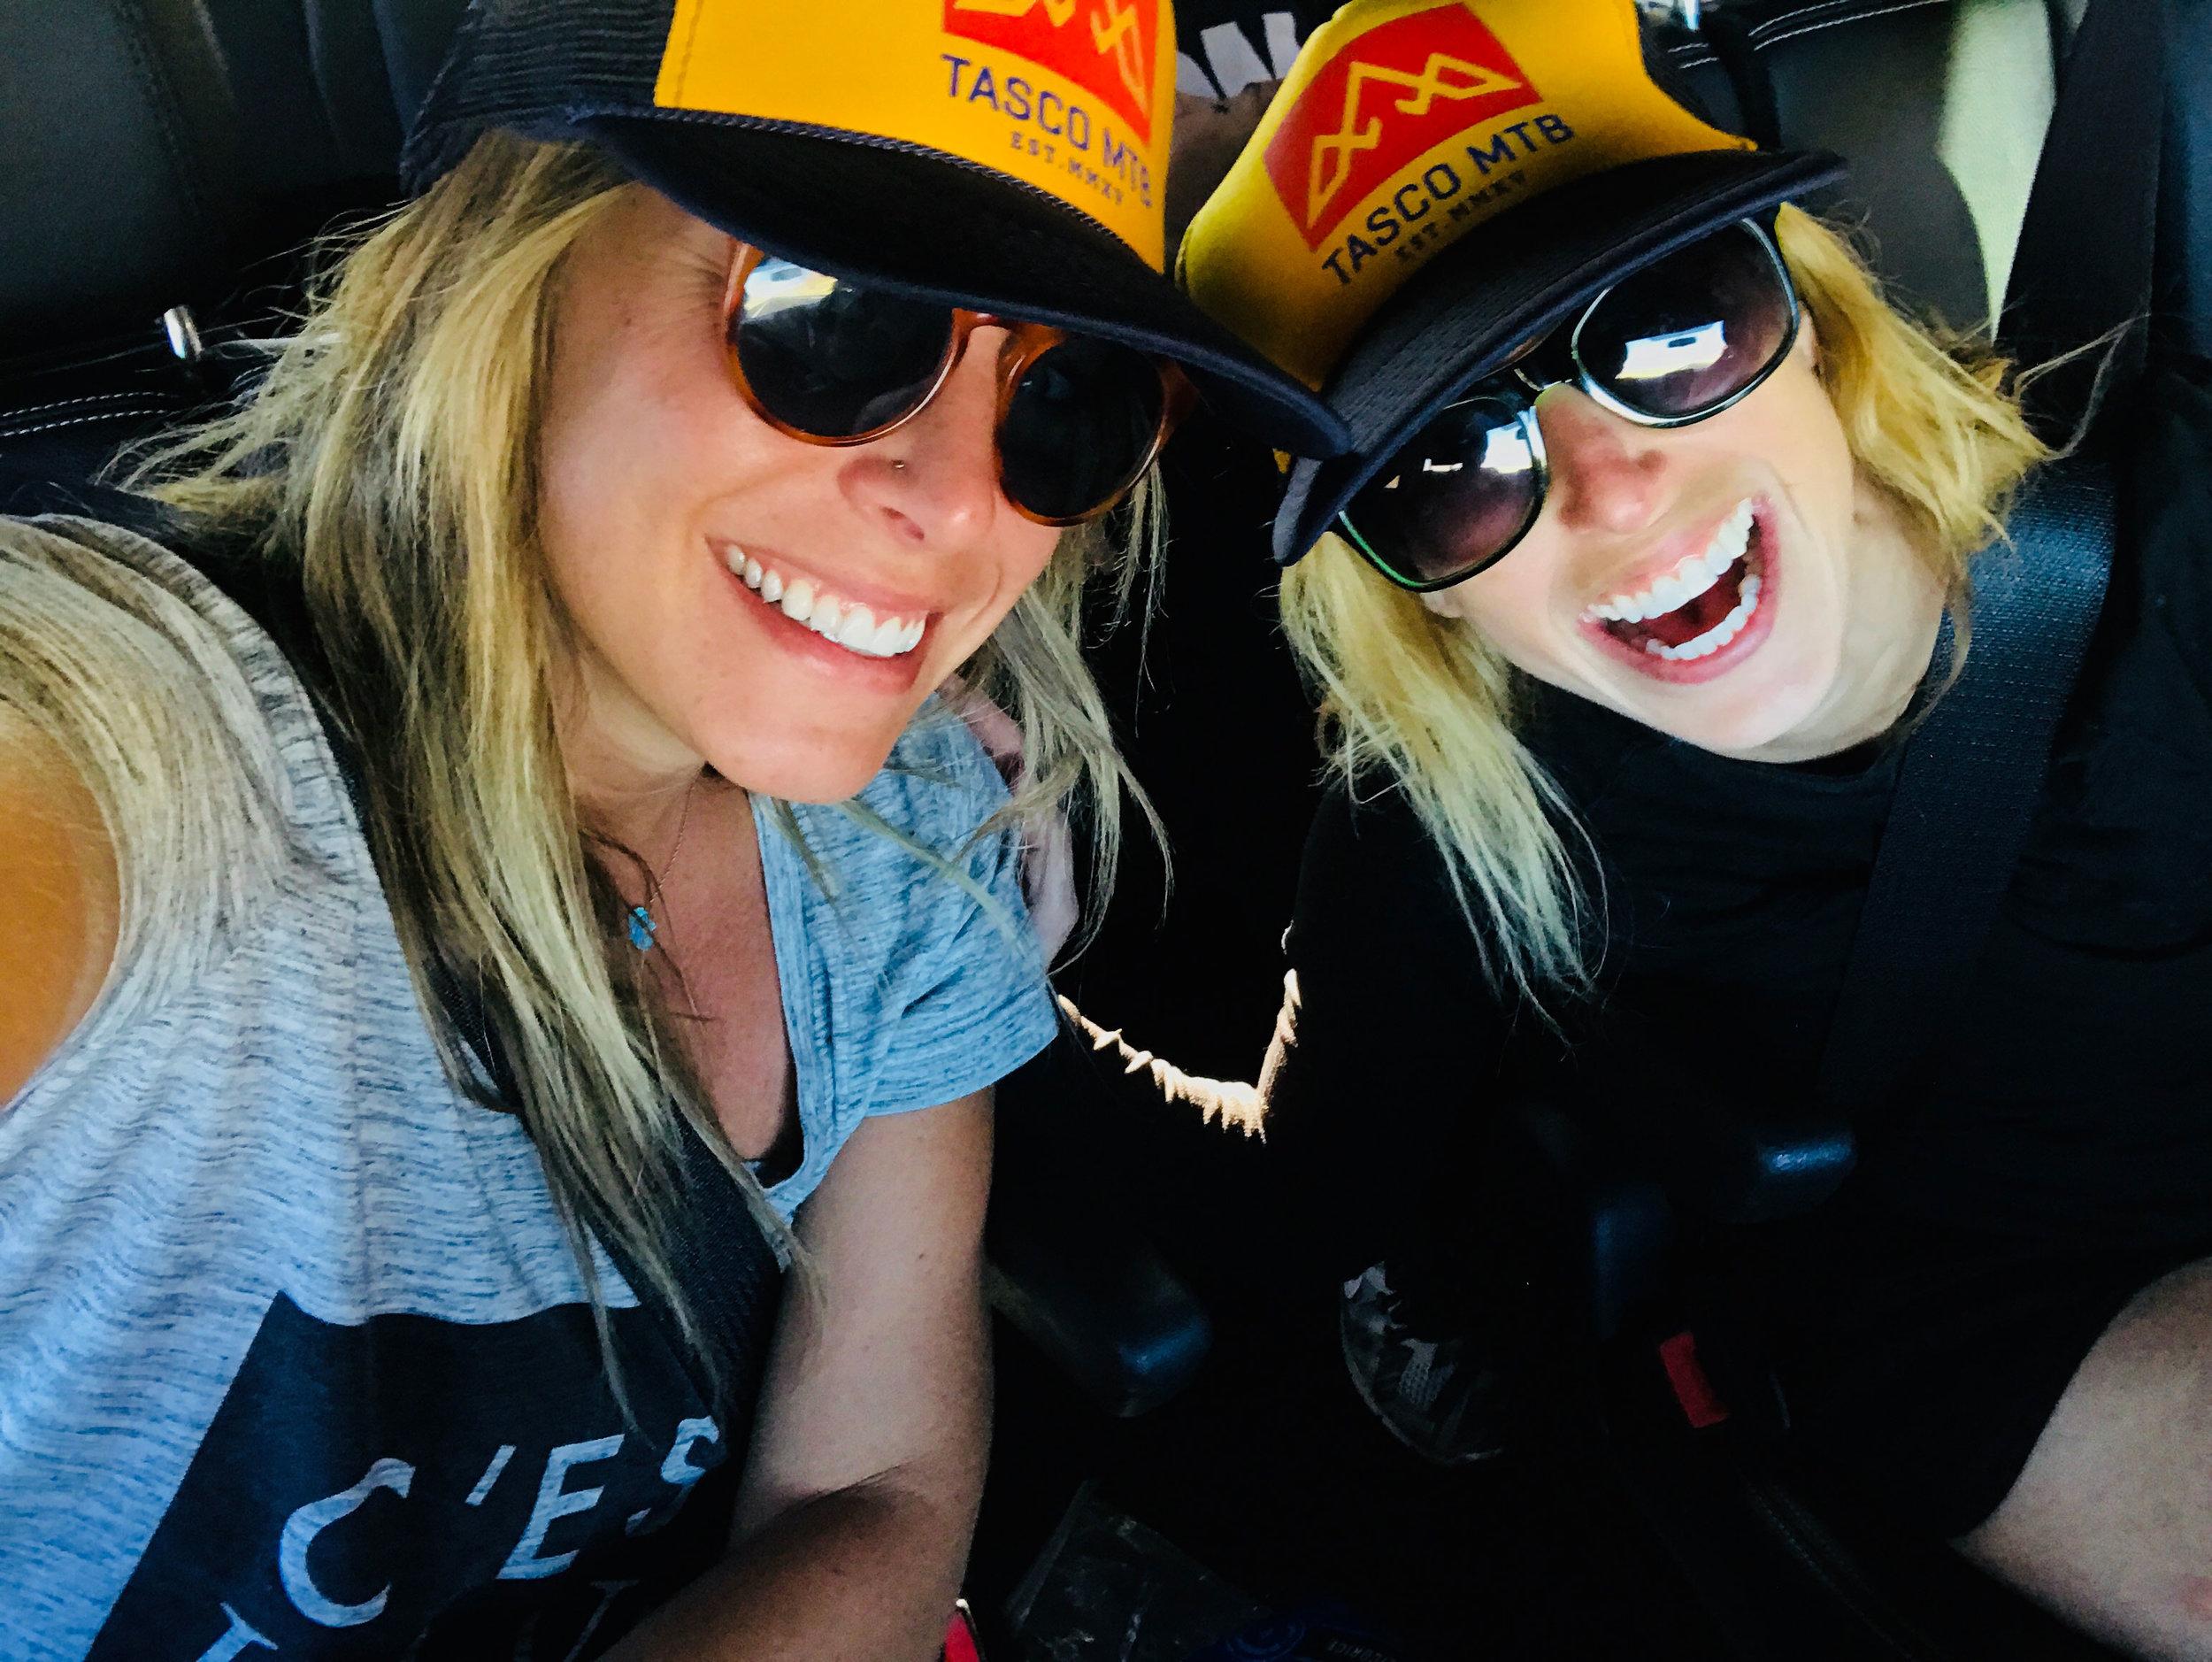 Rocking our TASCO MTB hats on last week's road trip.